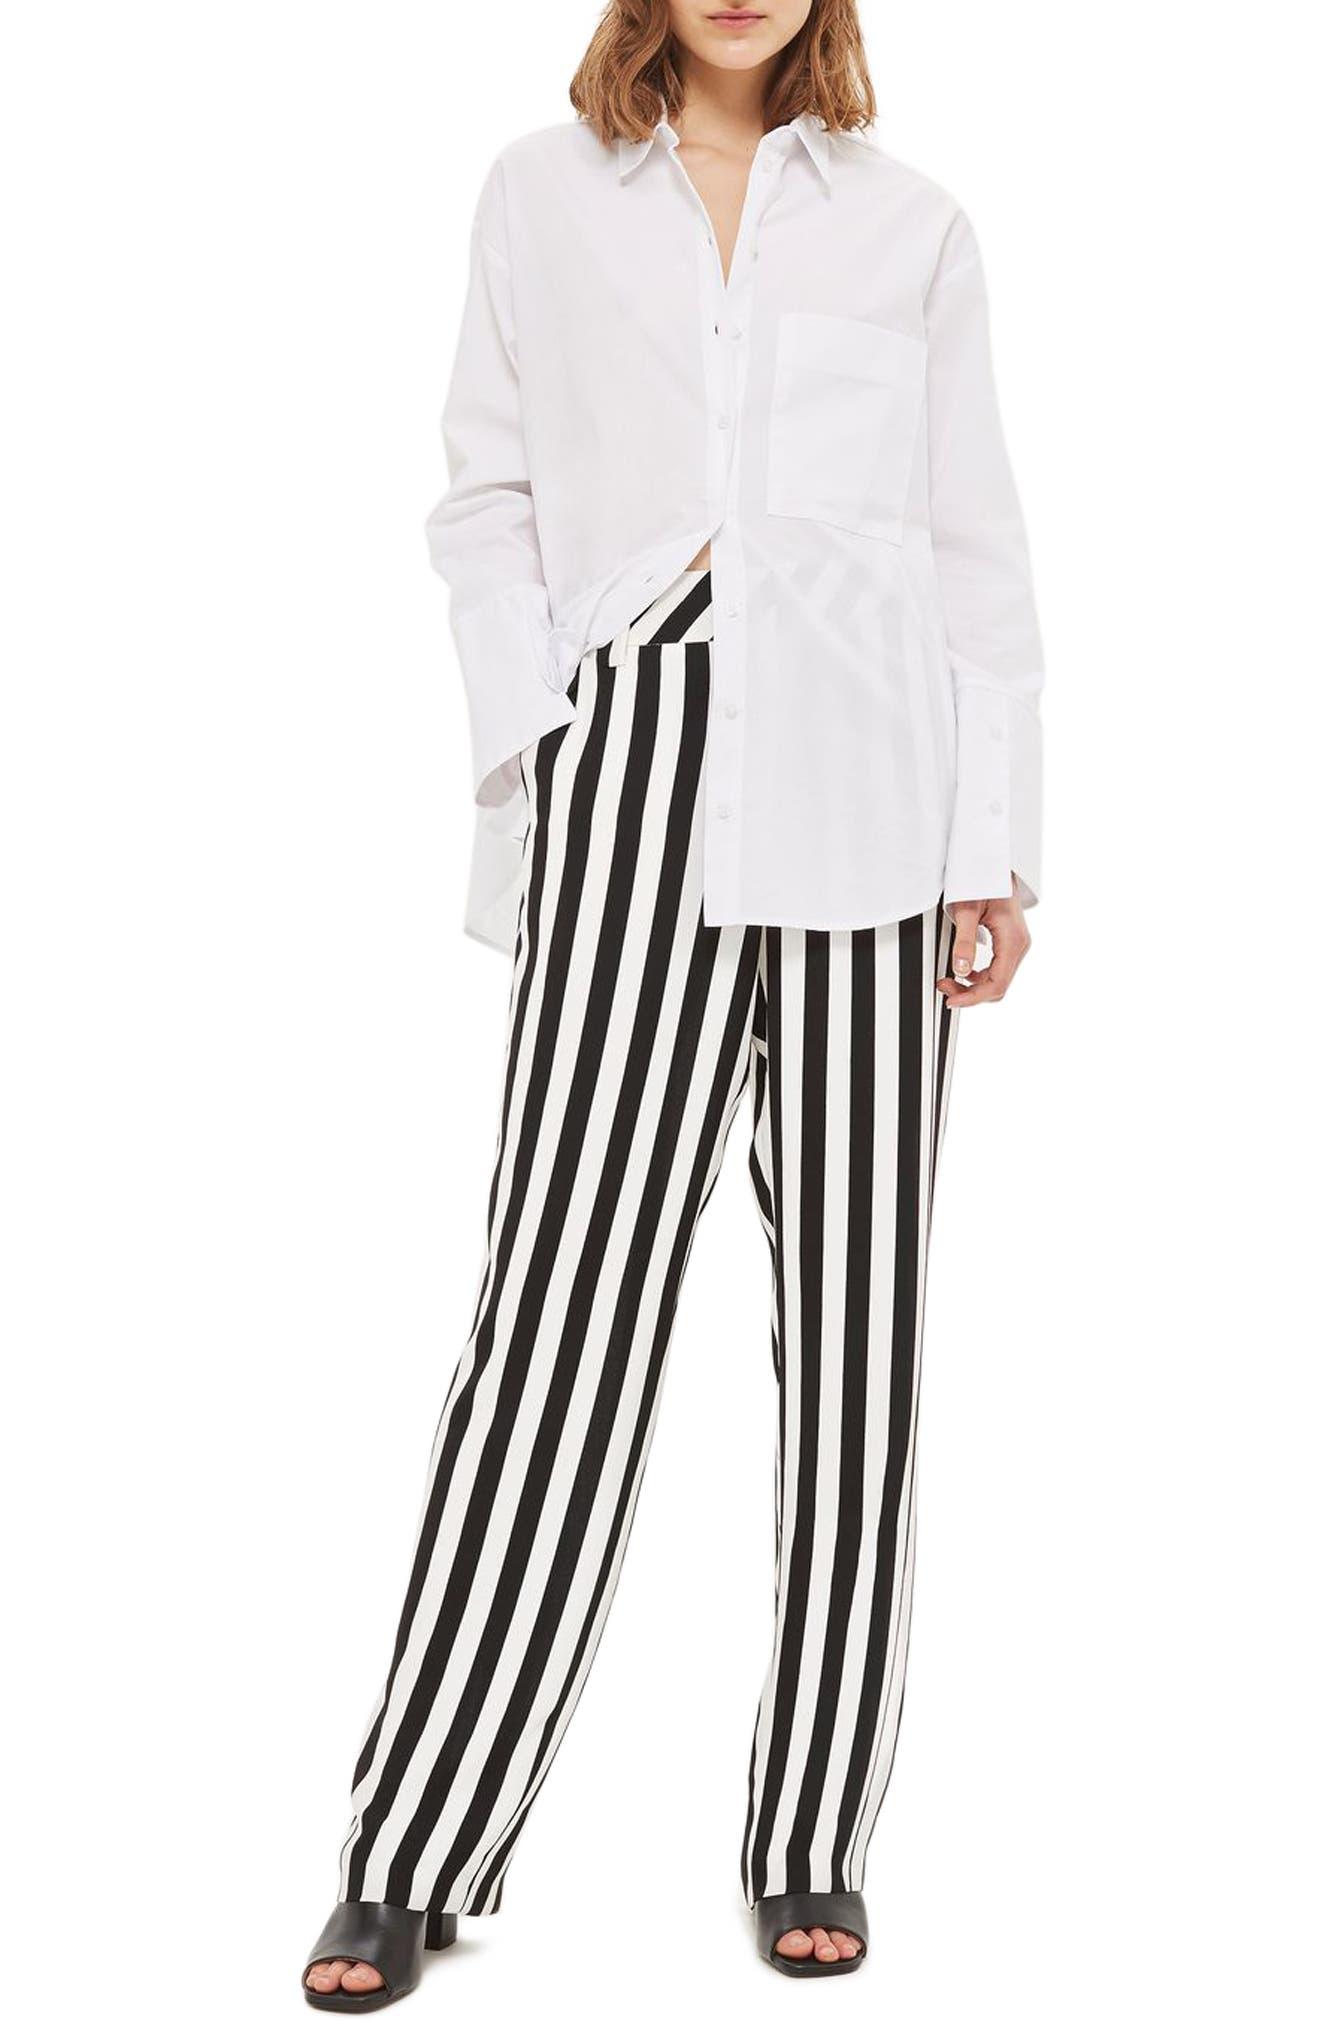 Humbug Stripe Trousers,                         Main,                         color, 001